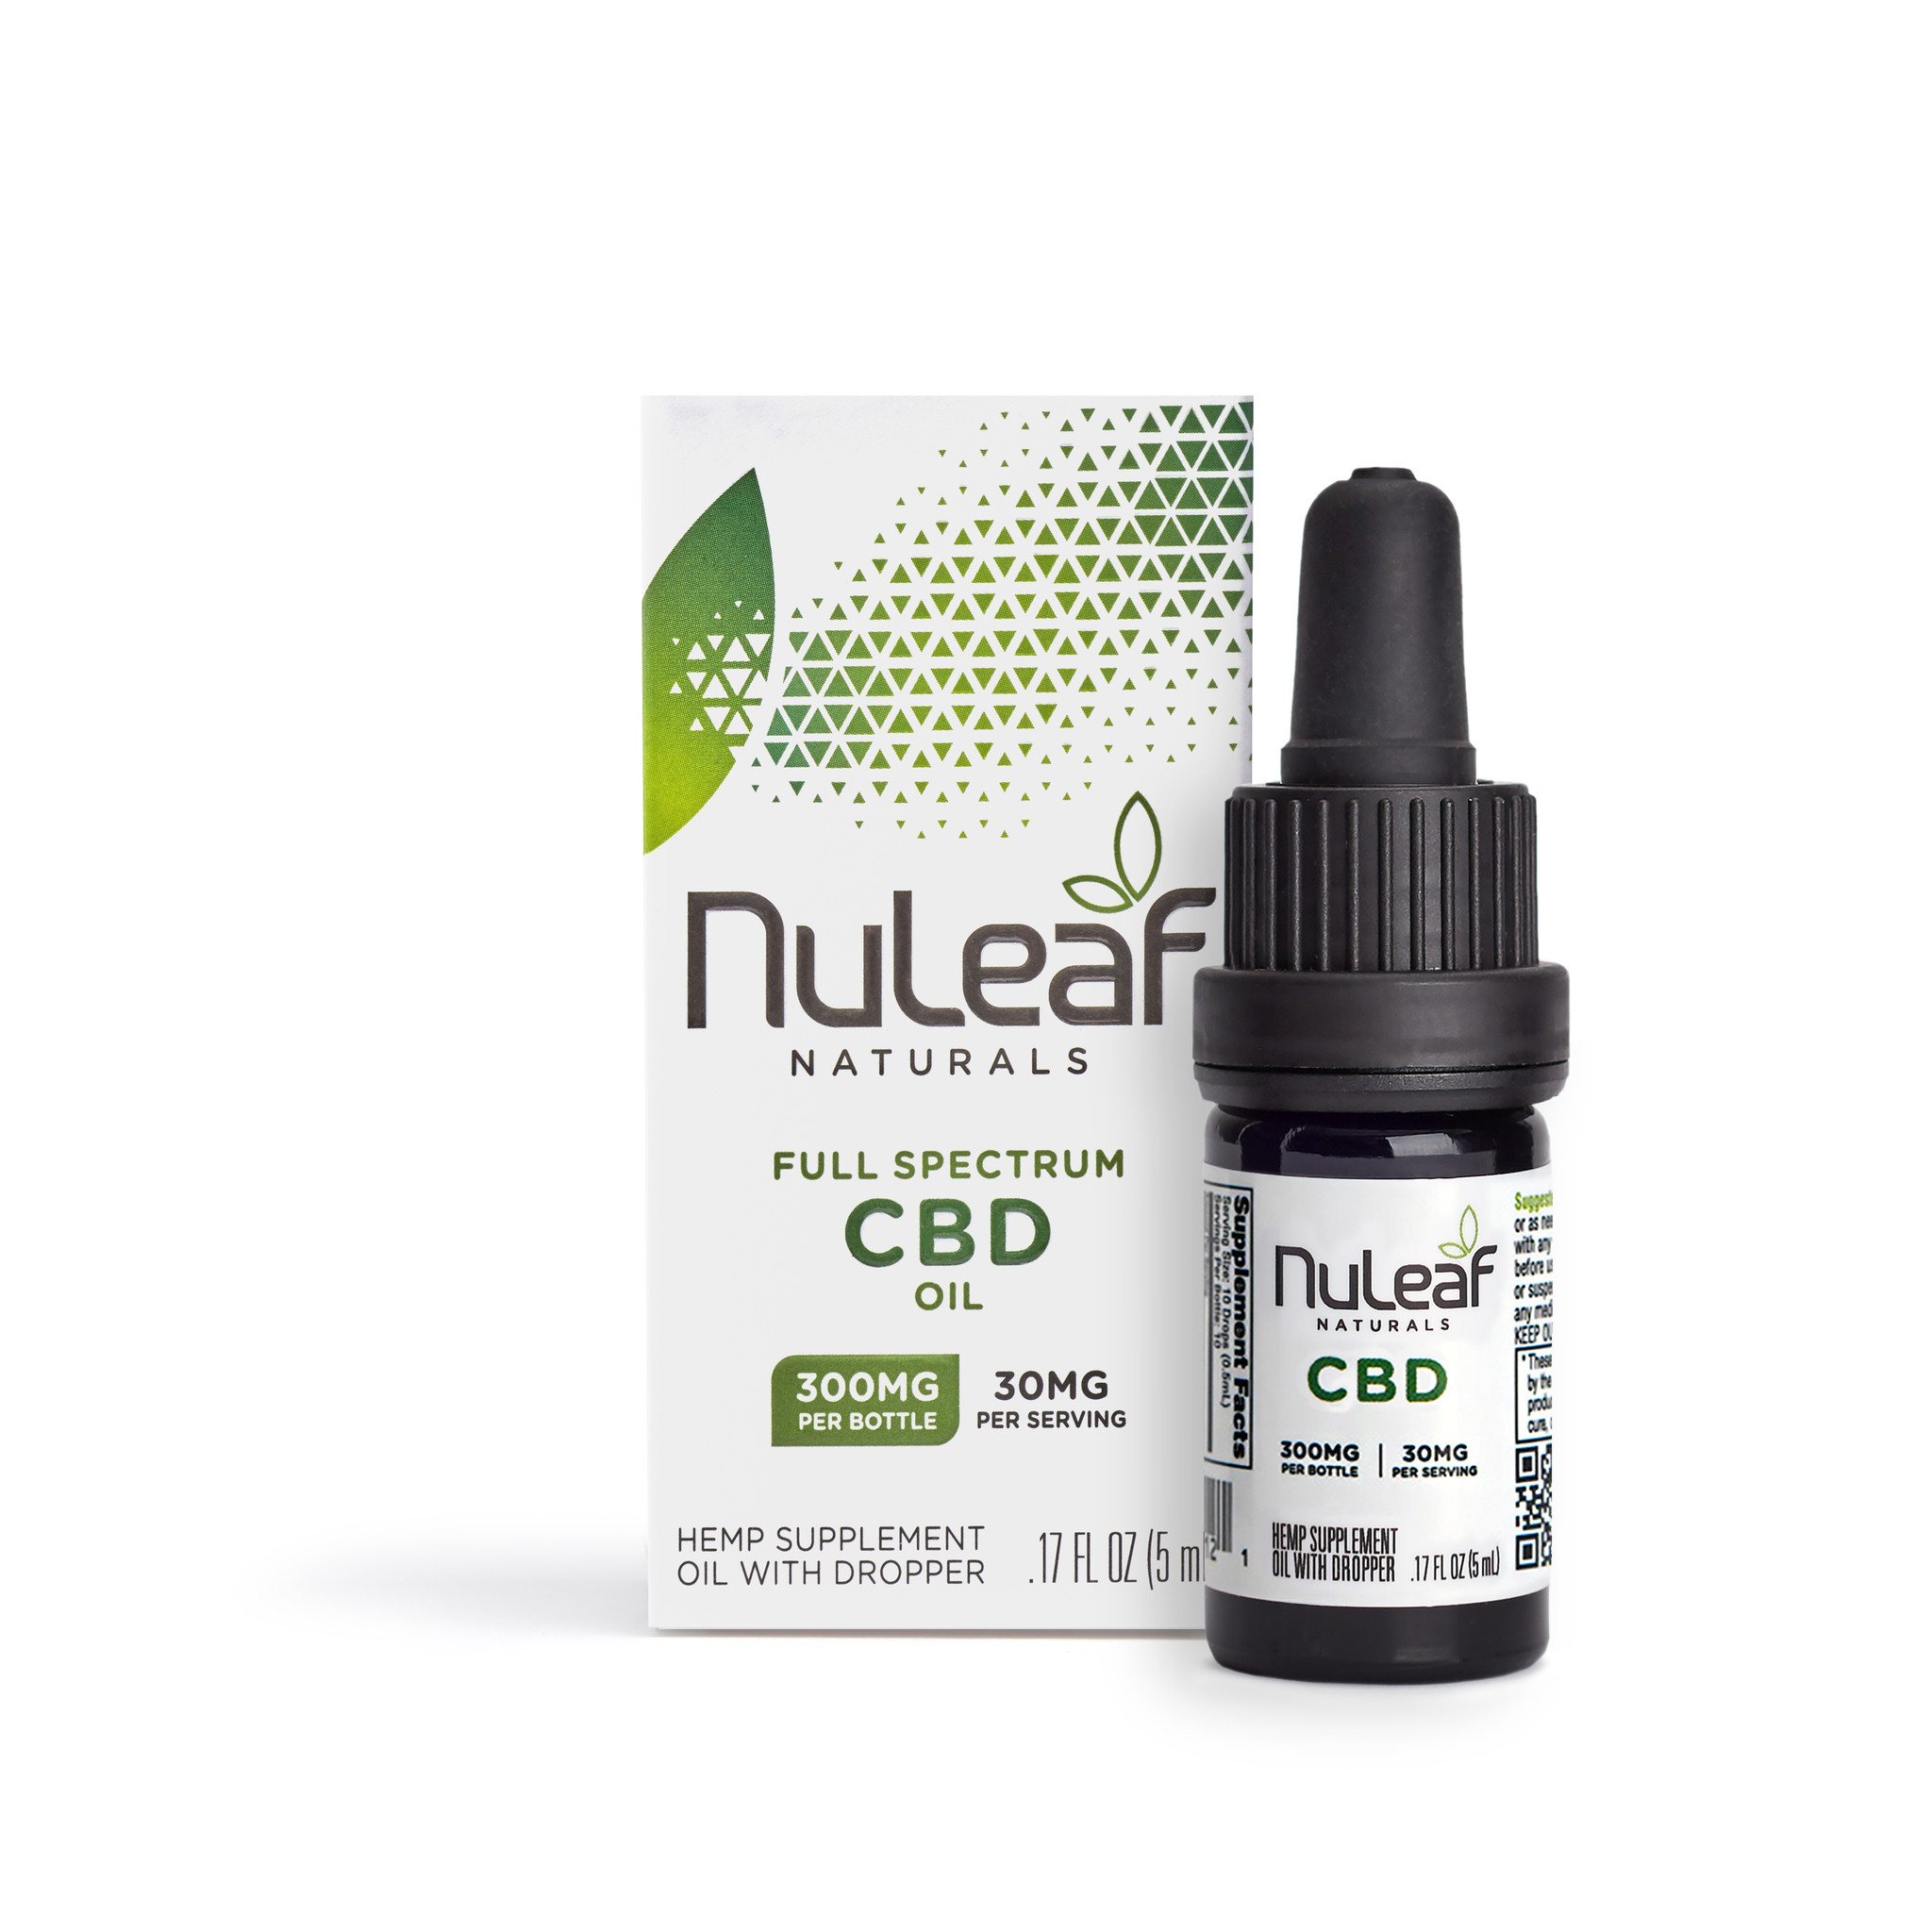 NuLeaf Naturals FULL SPECTRUM CBD OIL | HIGH GRADE HEMP EXTRACT | 300mg | 50mg per ml | 5ml Bottles